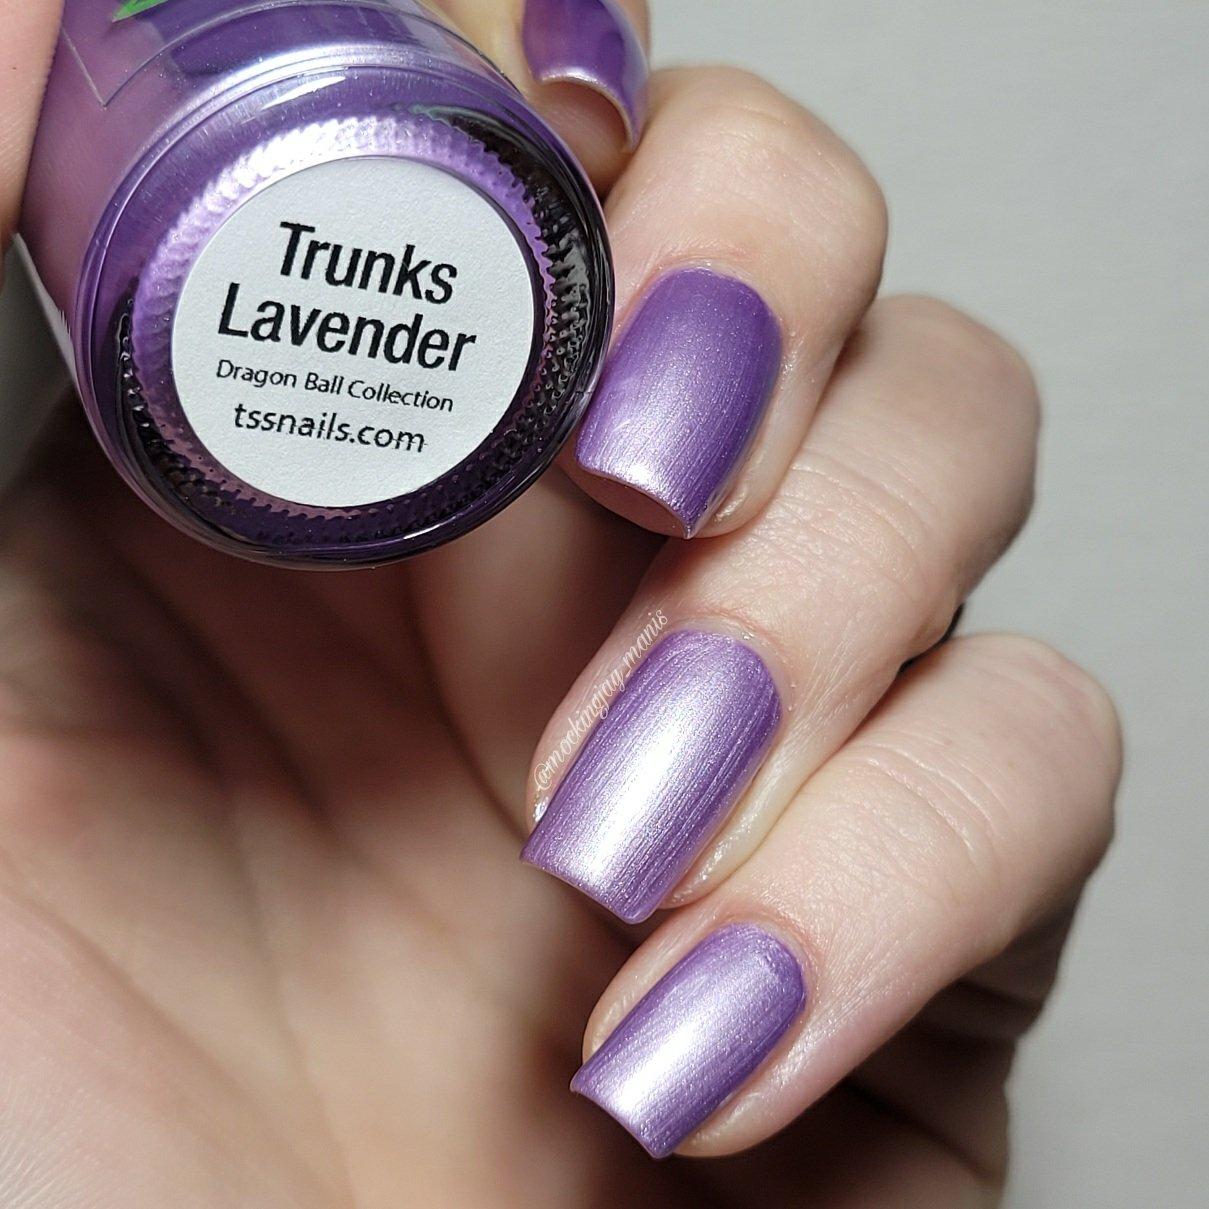 Image of Trunks Lavender Nail Polish